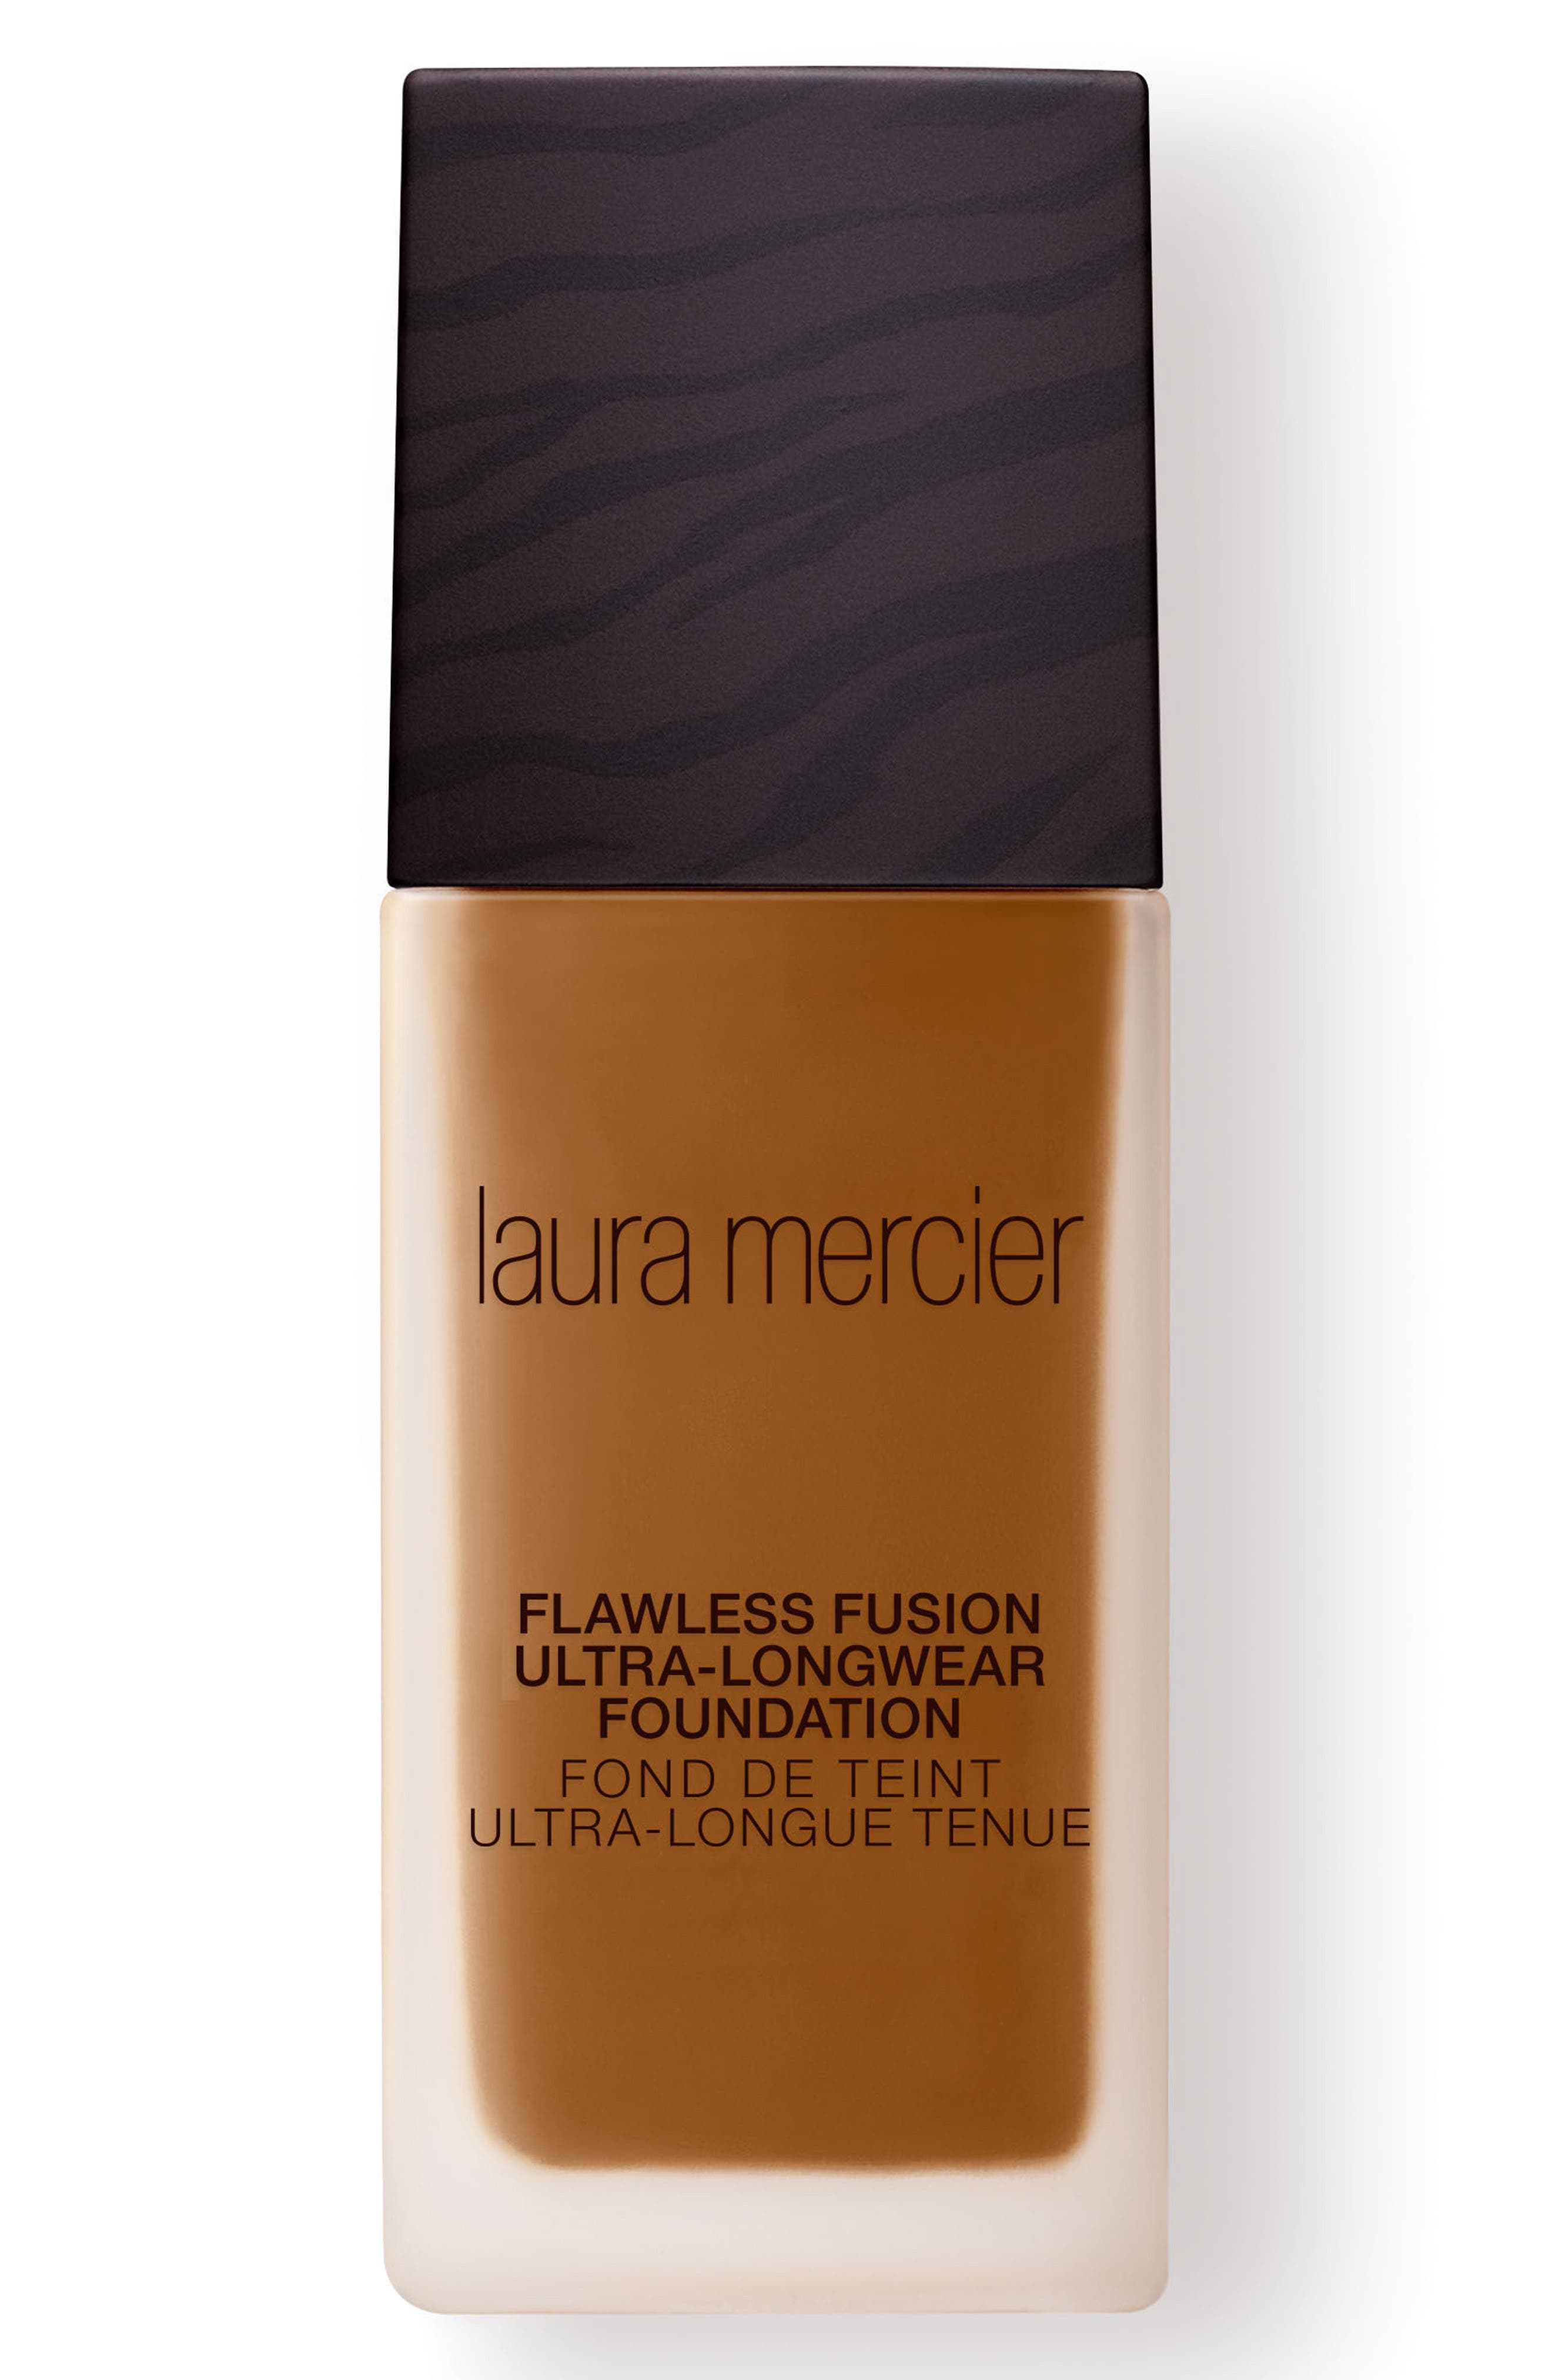 Flawless Fusion Ultra-Longwear Foundation,                         Main,                         color, 5C1 NUTMEG